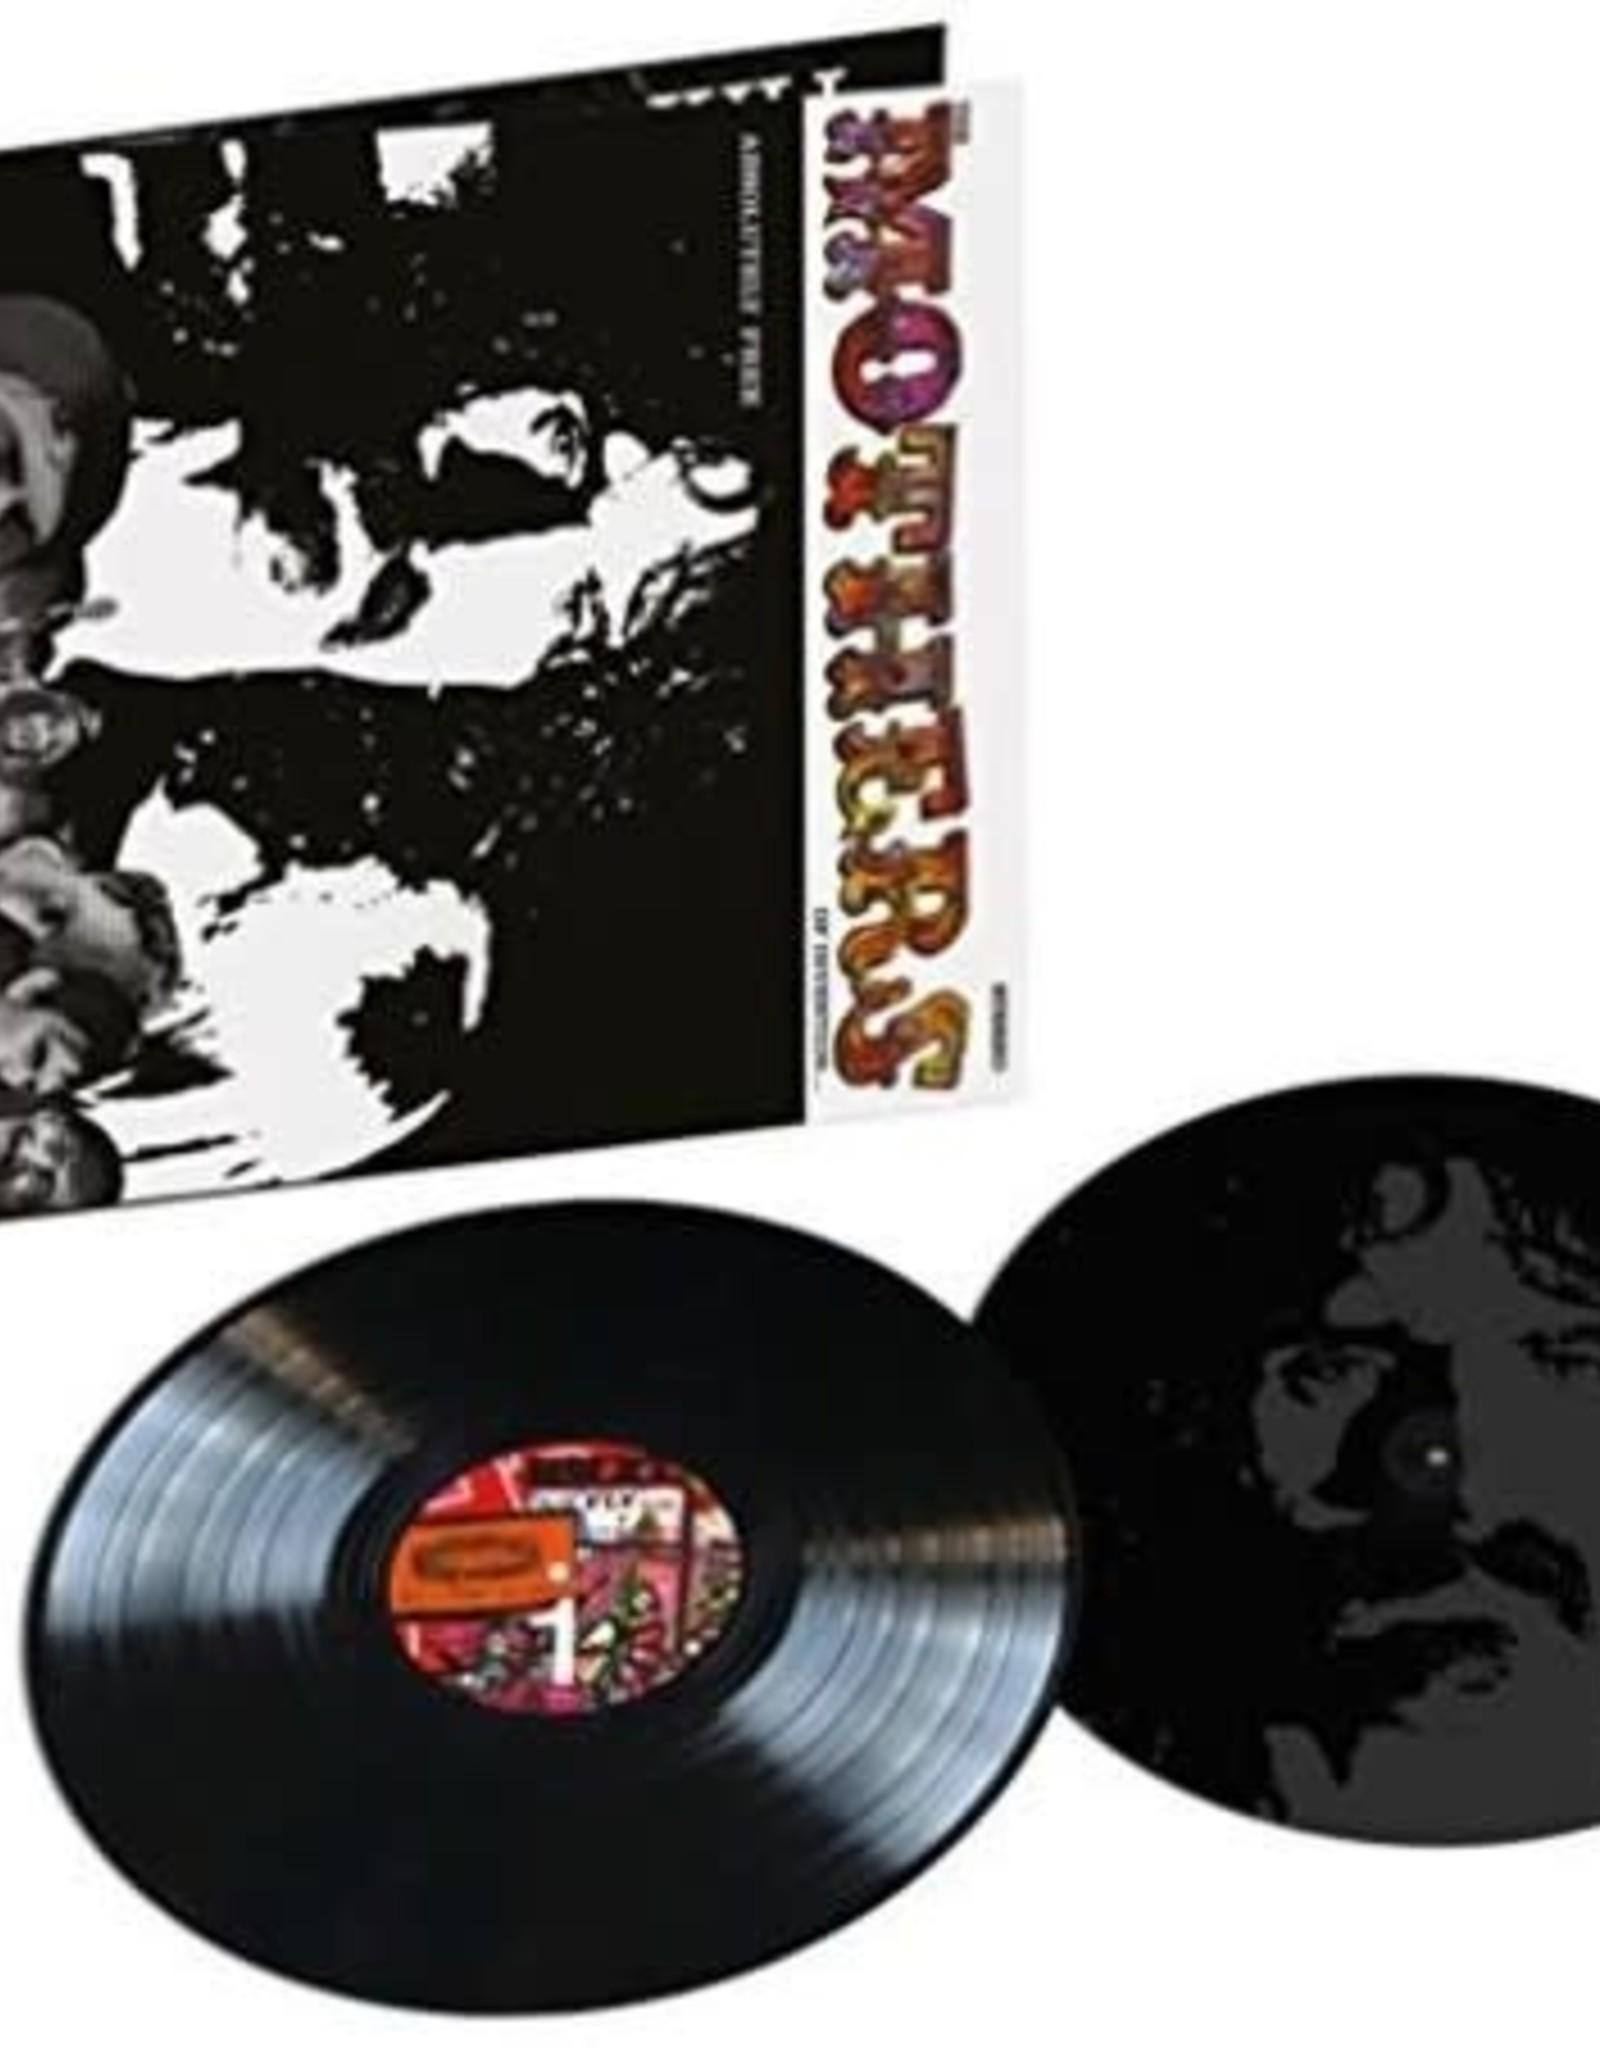 Frank Zappa - Absolutely Free